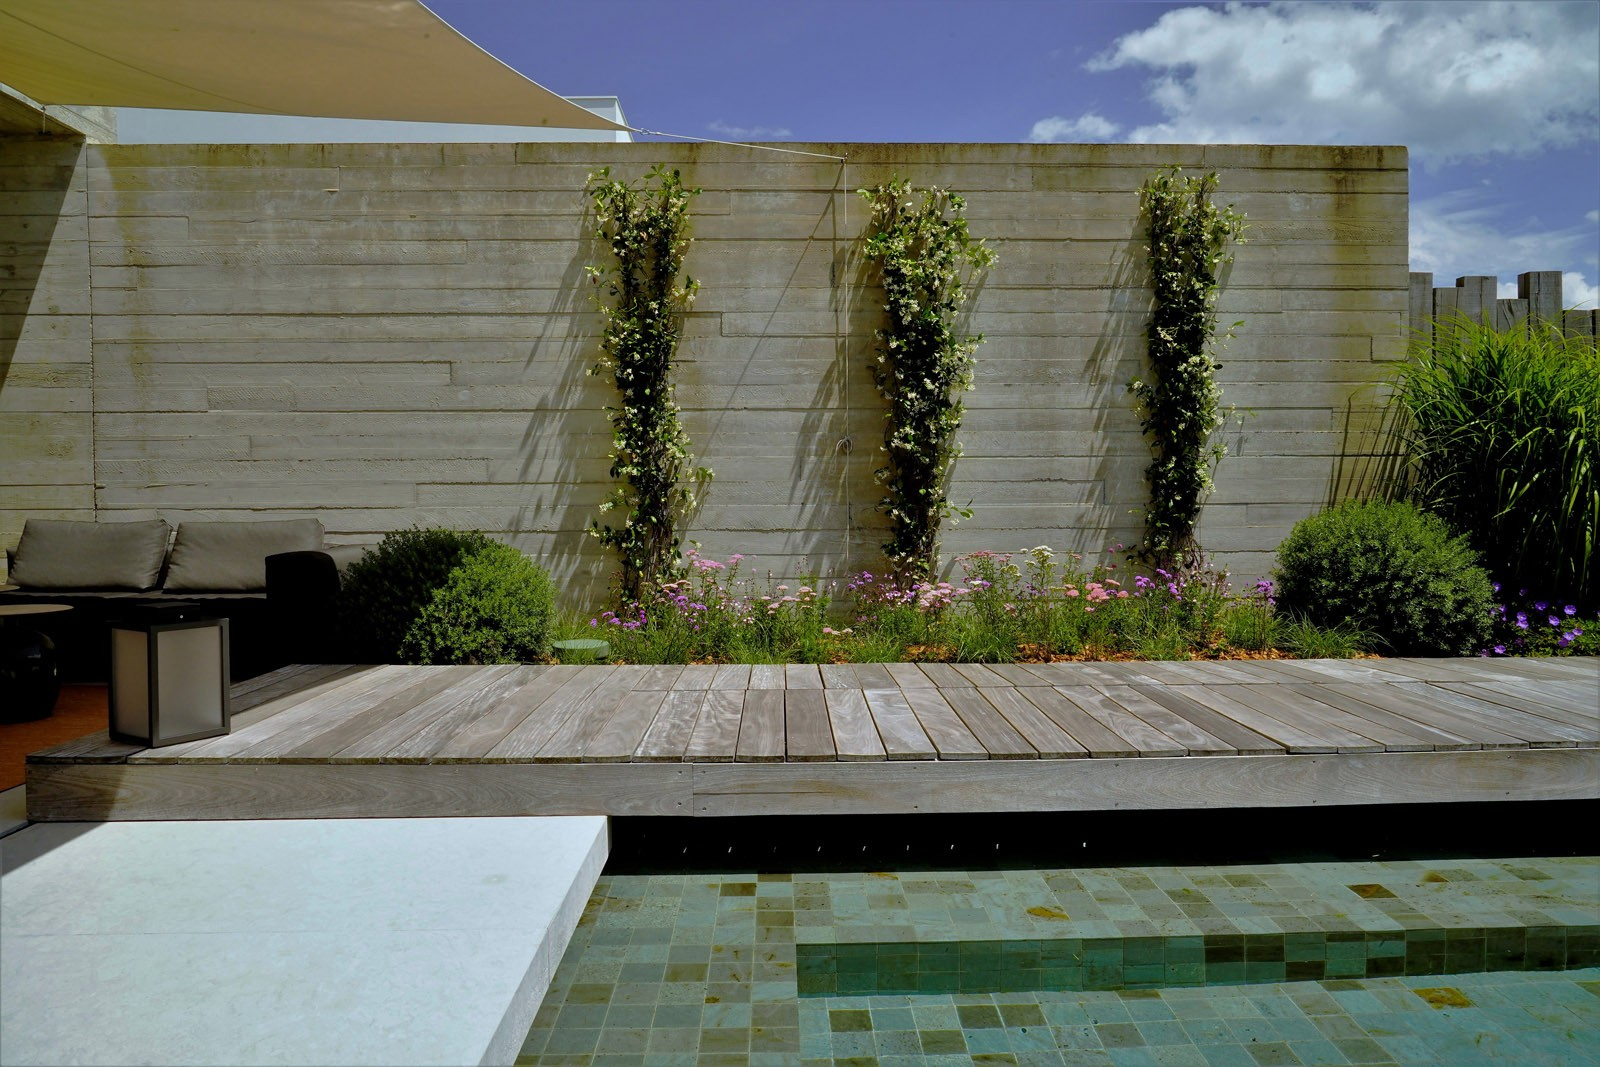 015-Blossom-Paysage-Architecte-Paysagiste-Bayonne-Anglet-Biarritz-Pays-Basque-Aménagement-Piscine